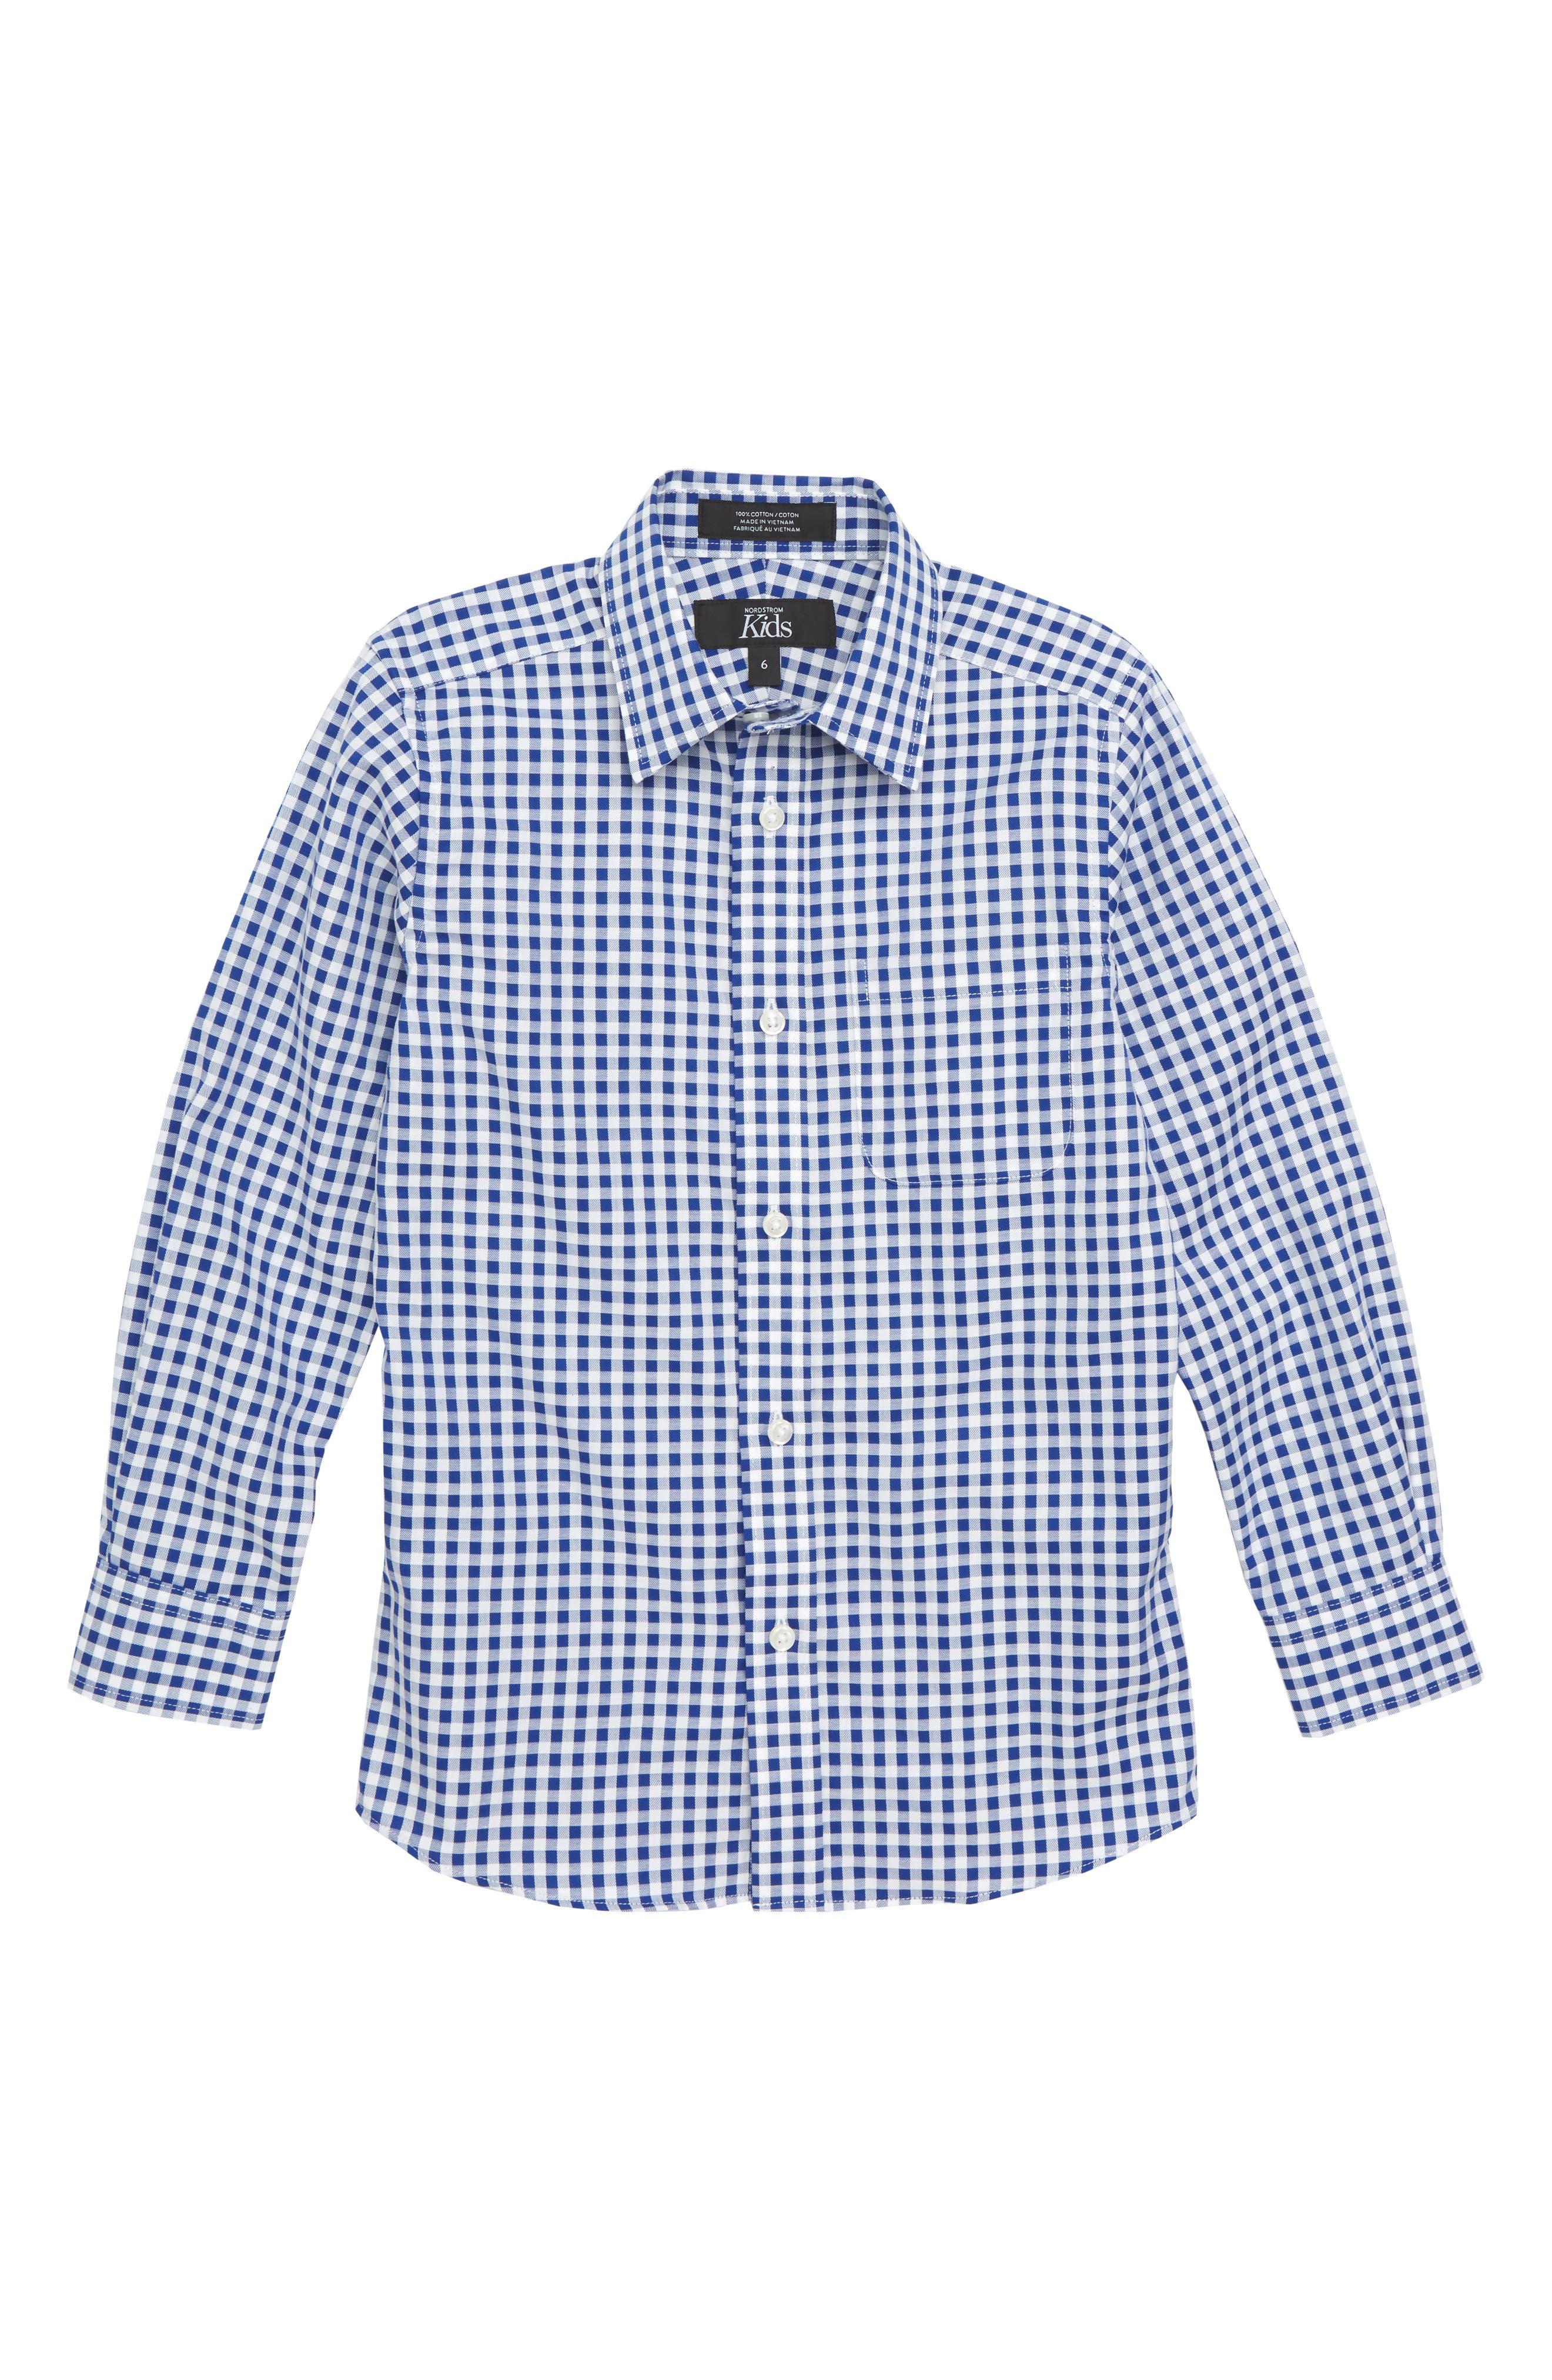 Check Dress Shirt,                         Main,                         color, Blue Mazarine- White Check